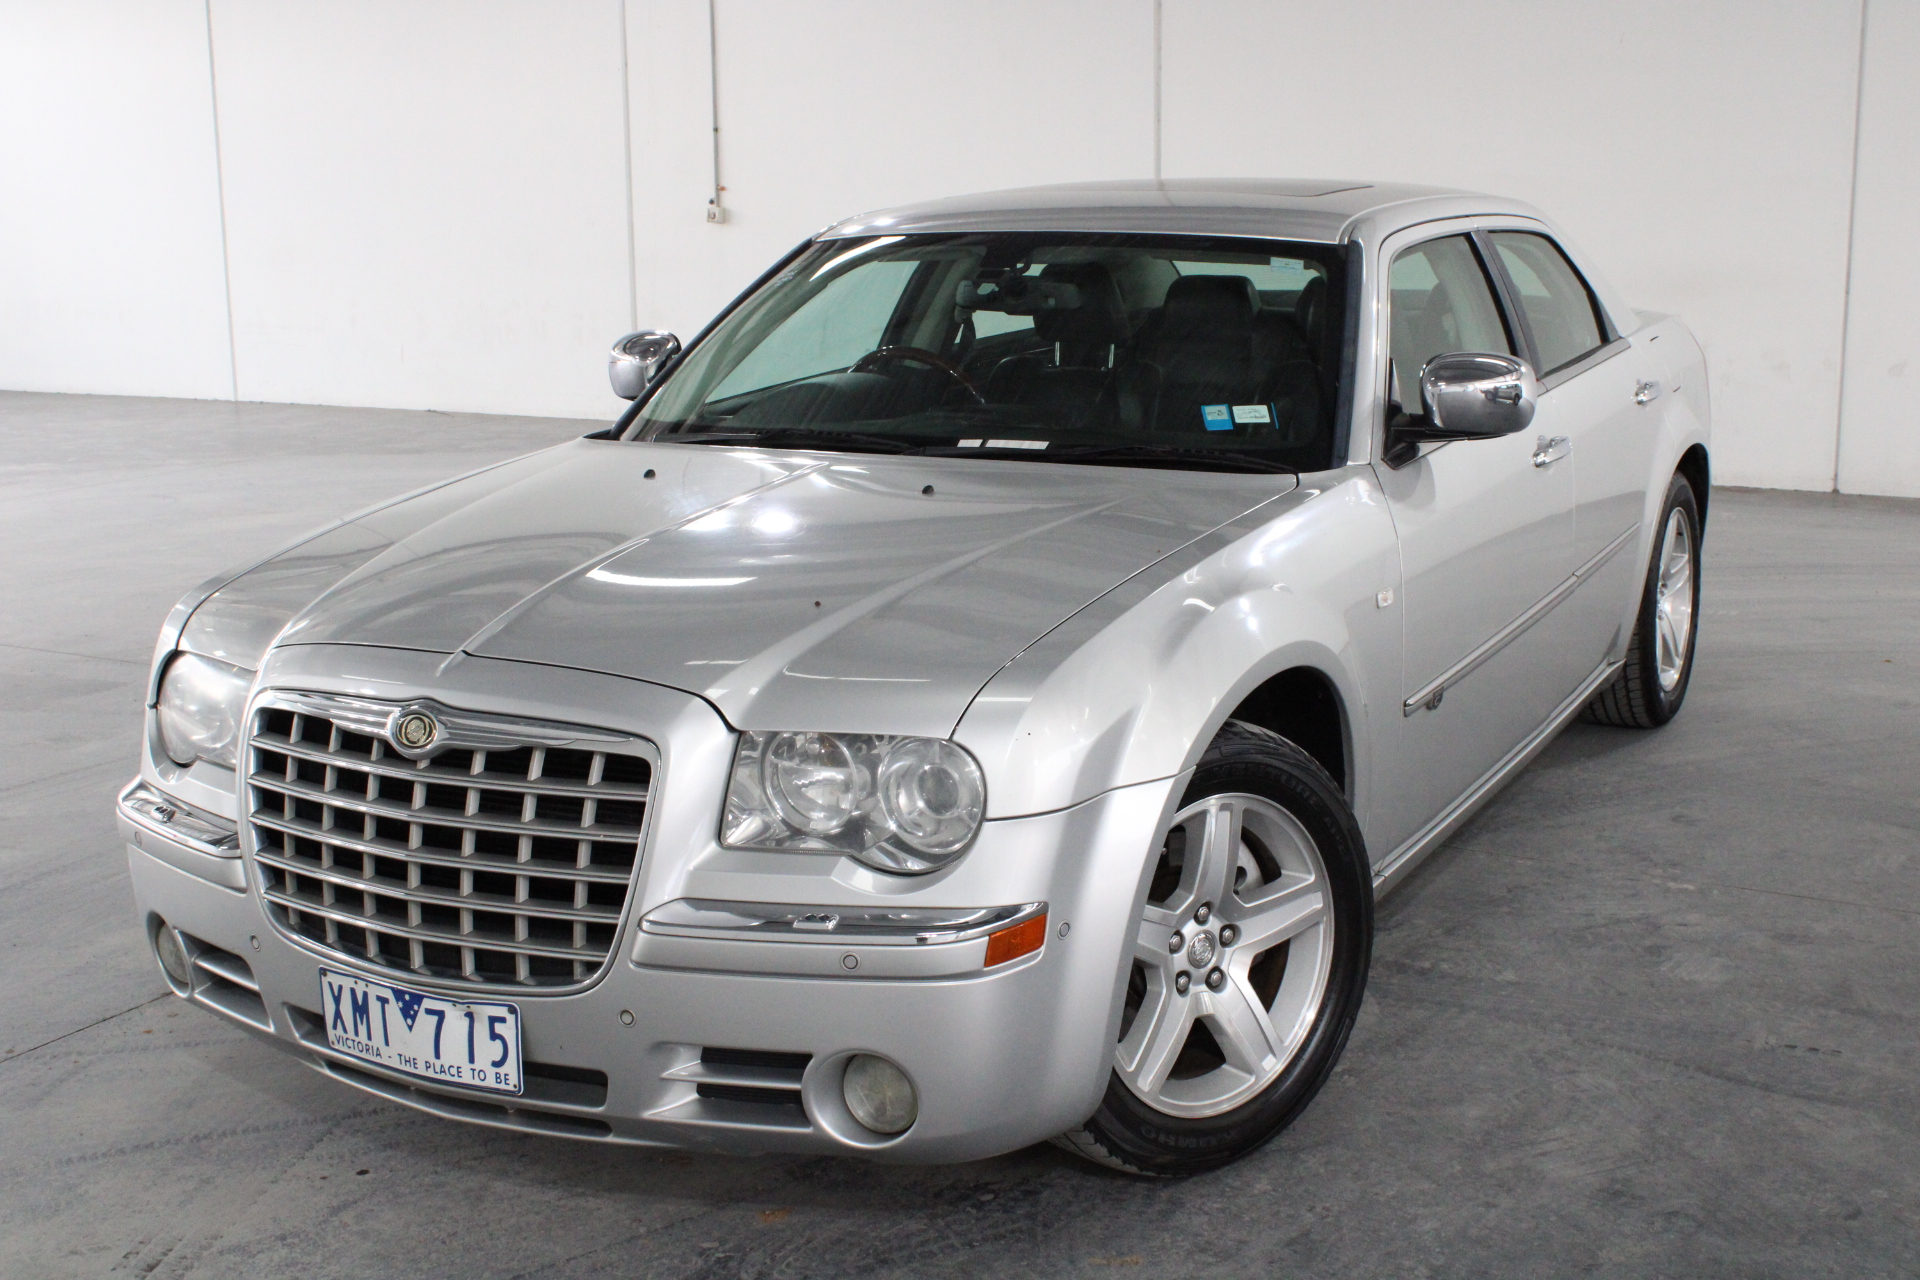 2009 Chrysler 300C 5.7 Hemi V8 LE Automatic Sedan